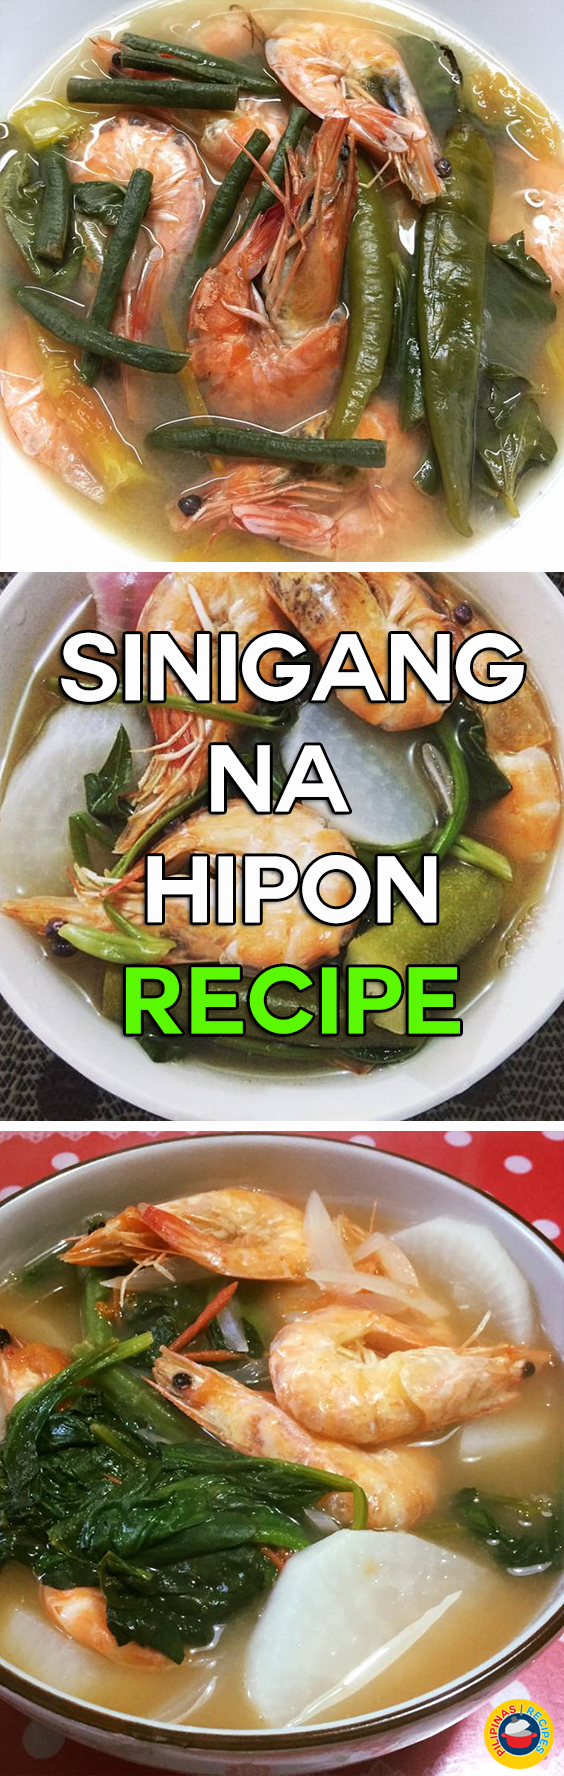 how to make sinigang na hipon